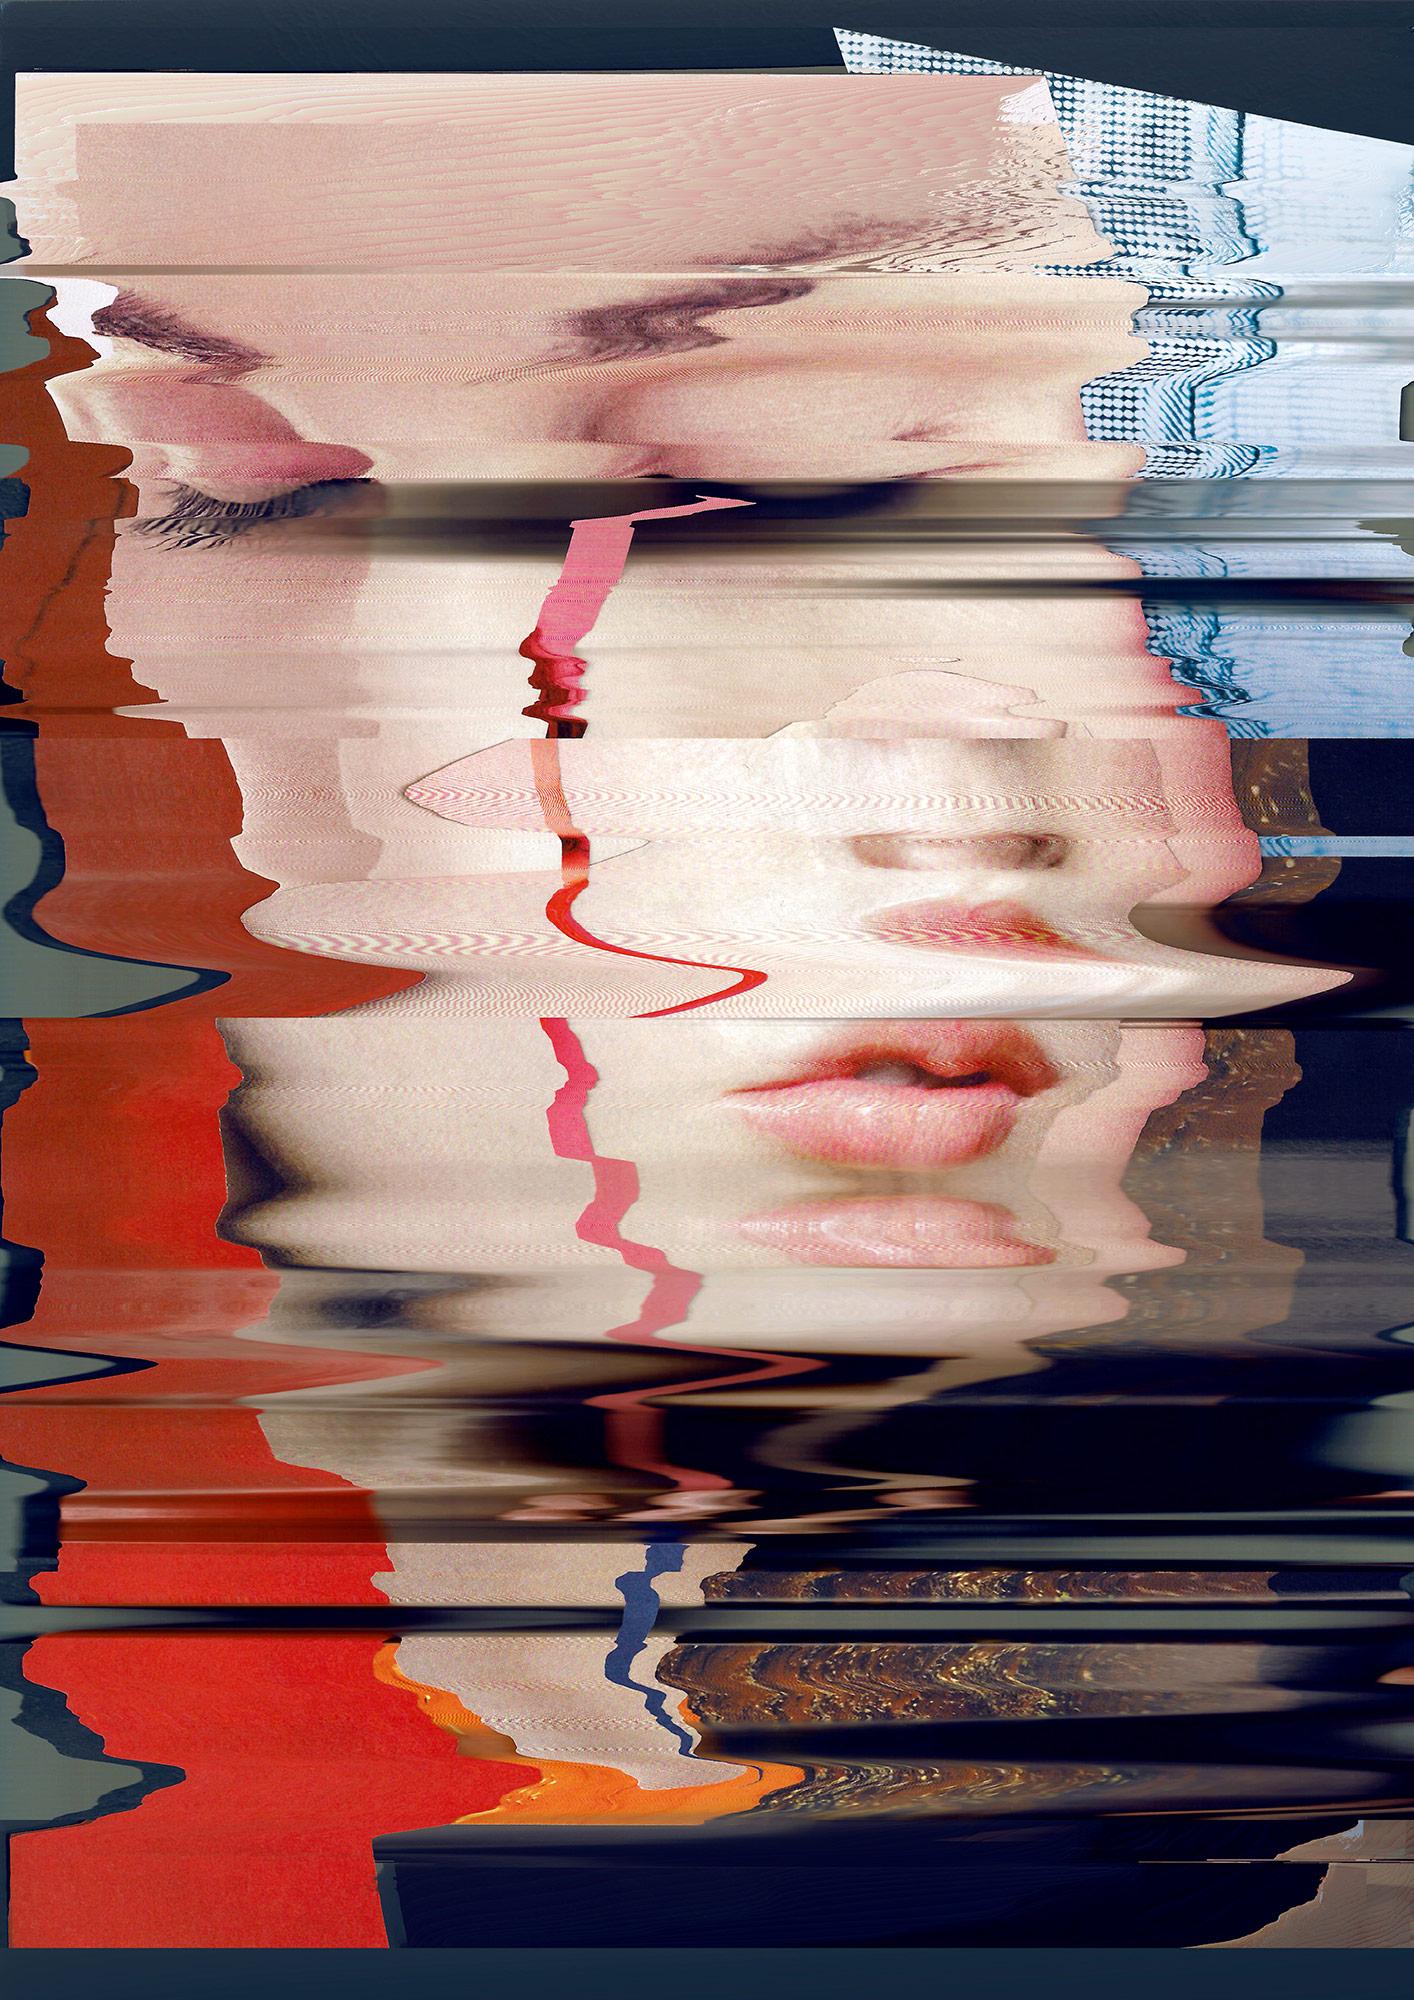 Ewa Doroszenko - Radical Beauty 03, photography